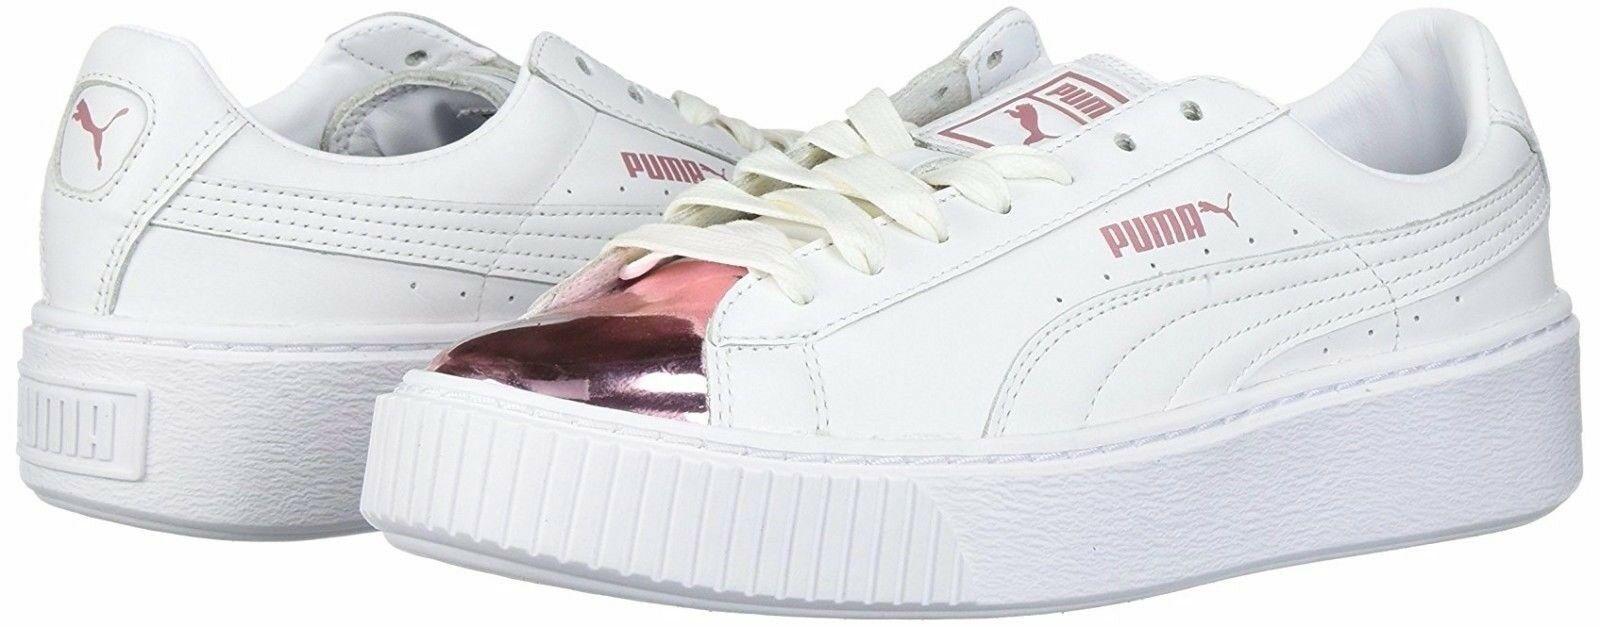 Women's PUMA Basket Basket Basket Platform Metallic Sneaker - 366169-04 White purplec Snow New 0fcaa5